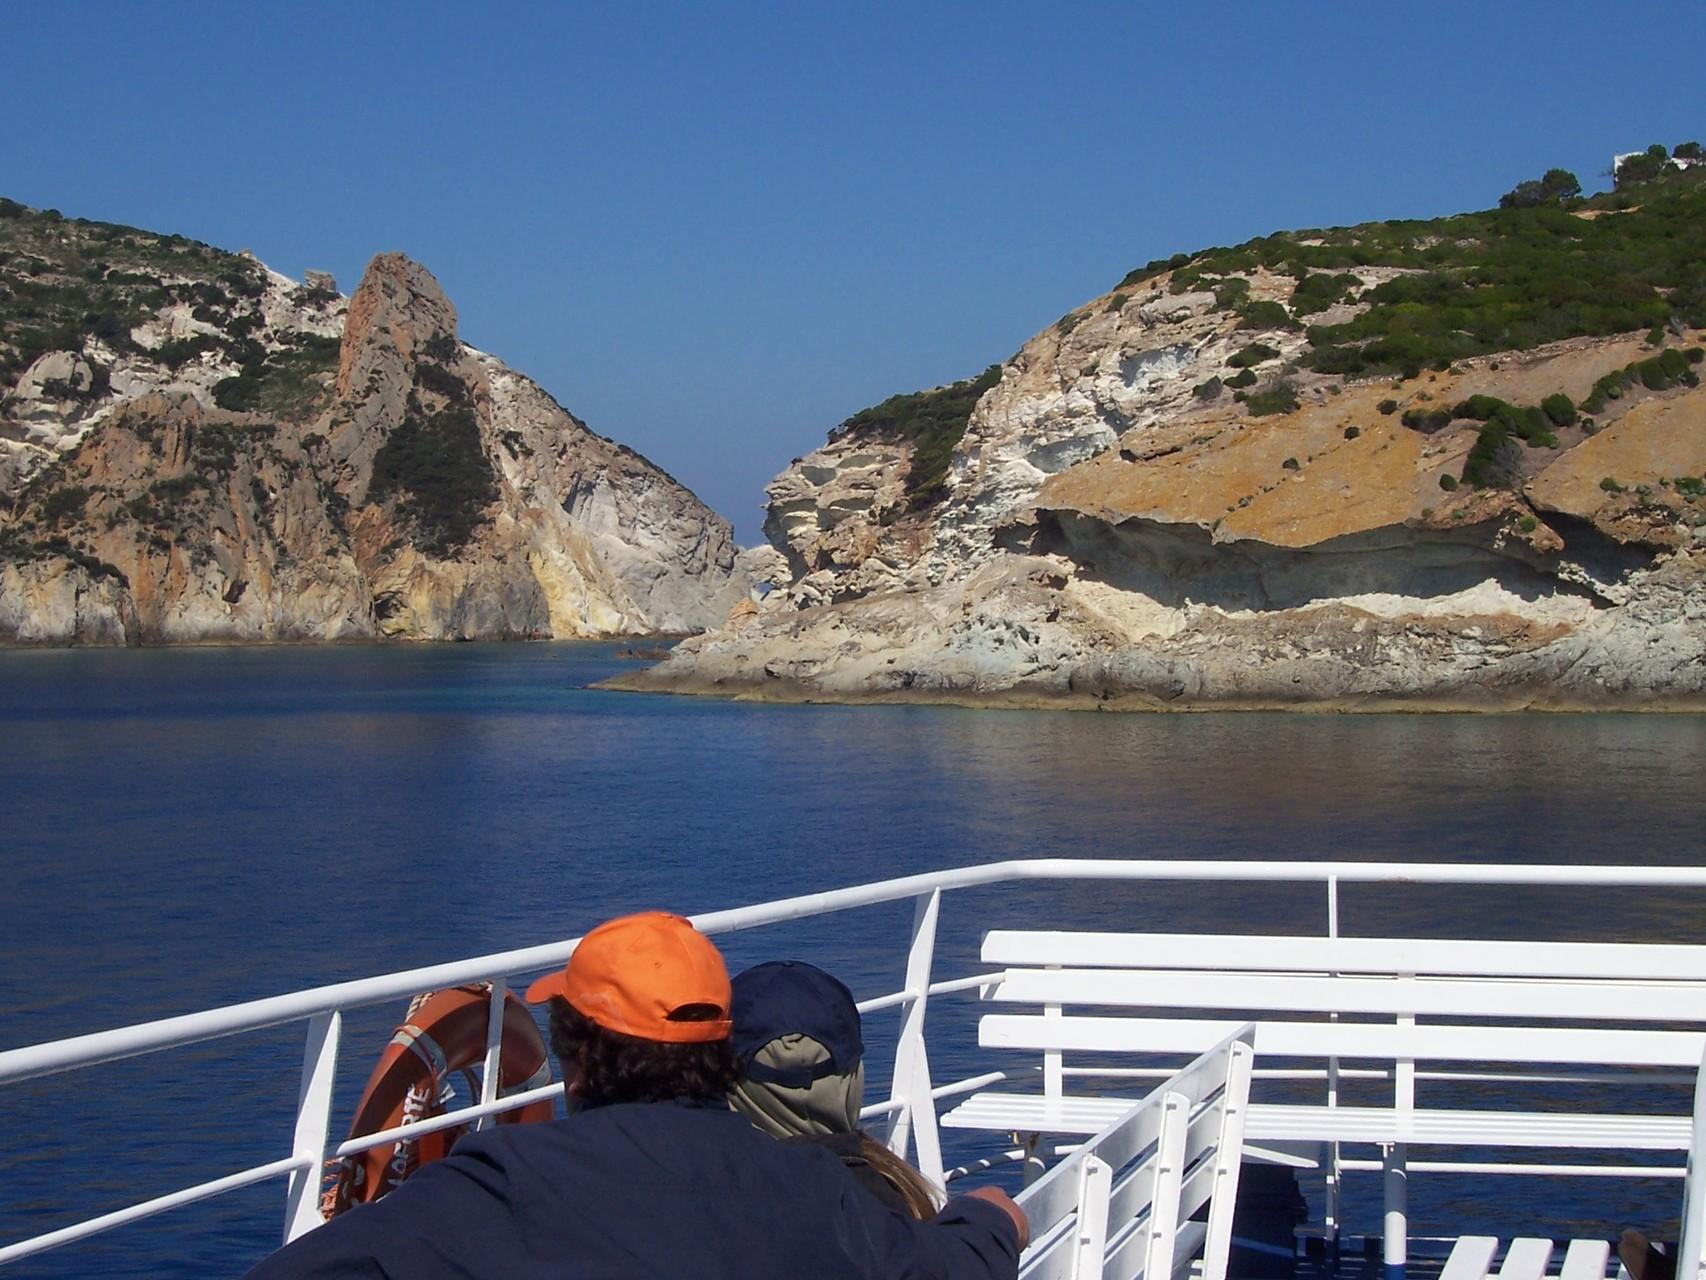 Archäologiereise Italien/Südliches Latium